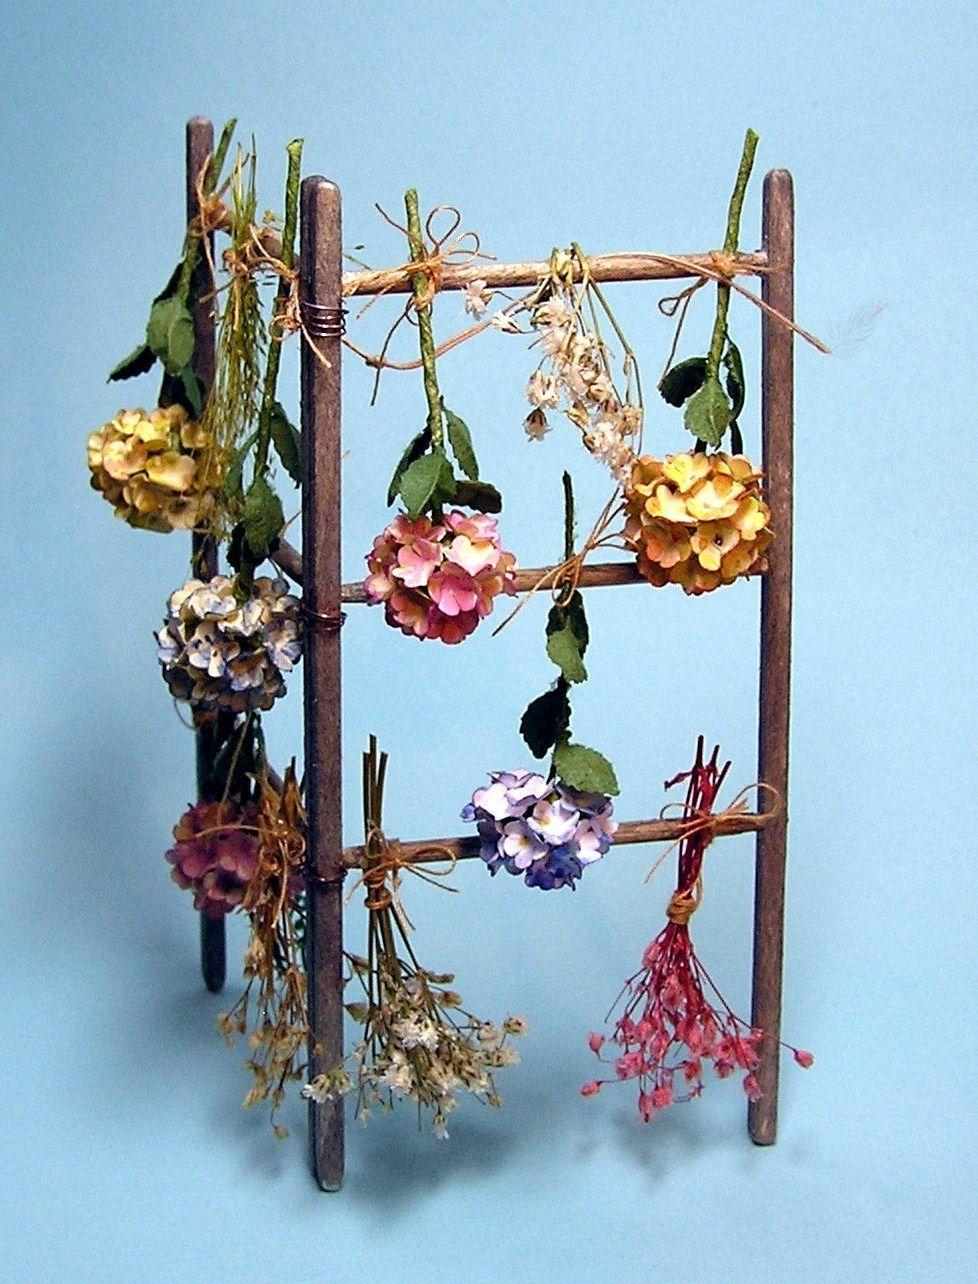 diy dollhouse miniatures by joann swanson - a drying rack plus many